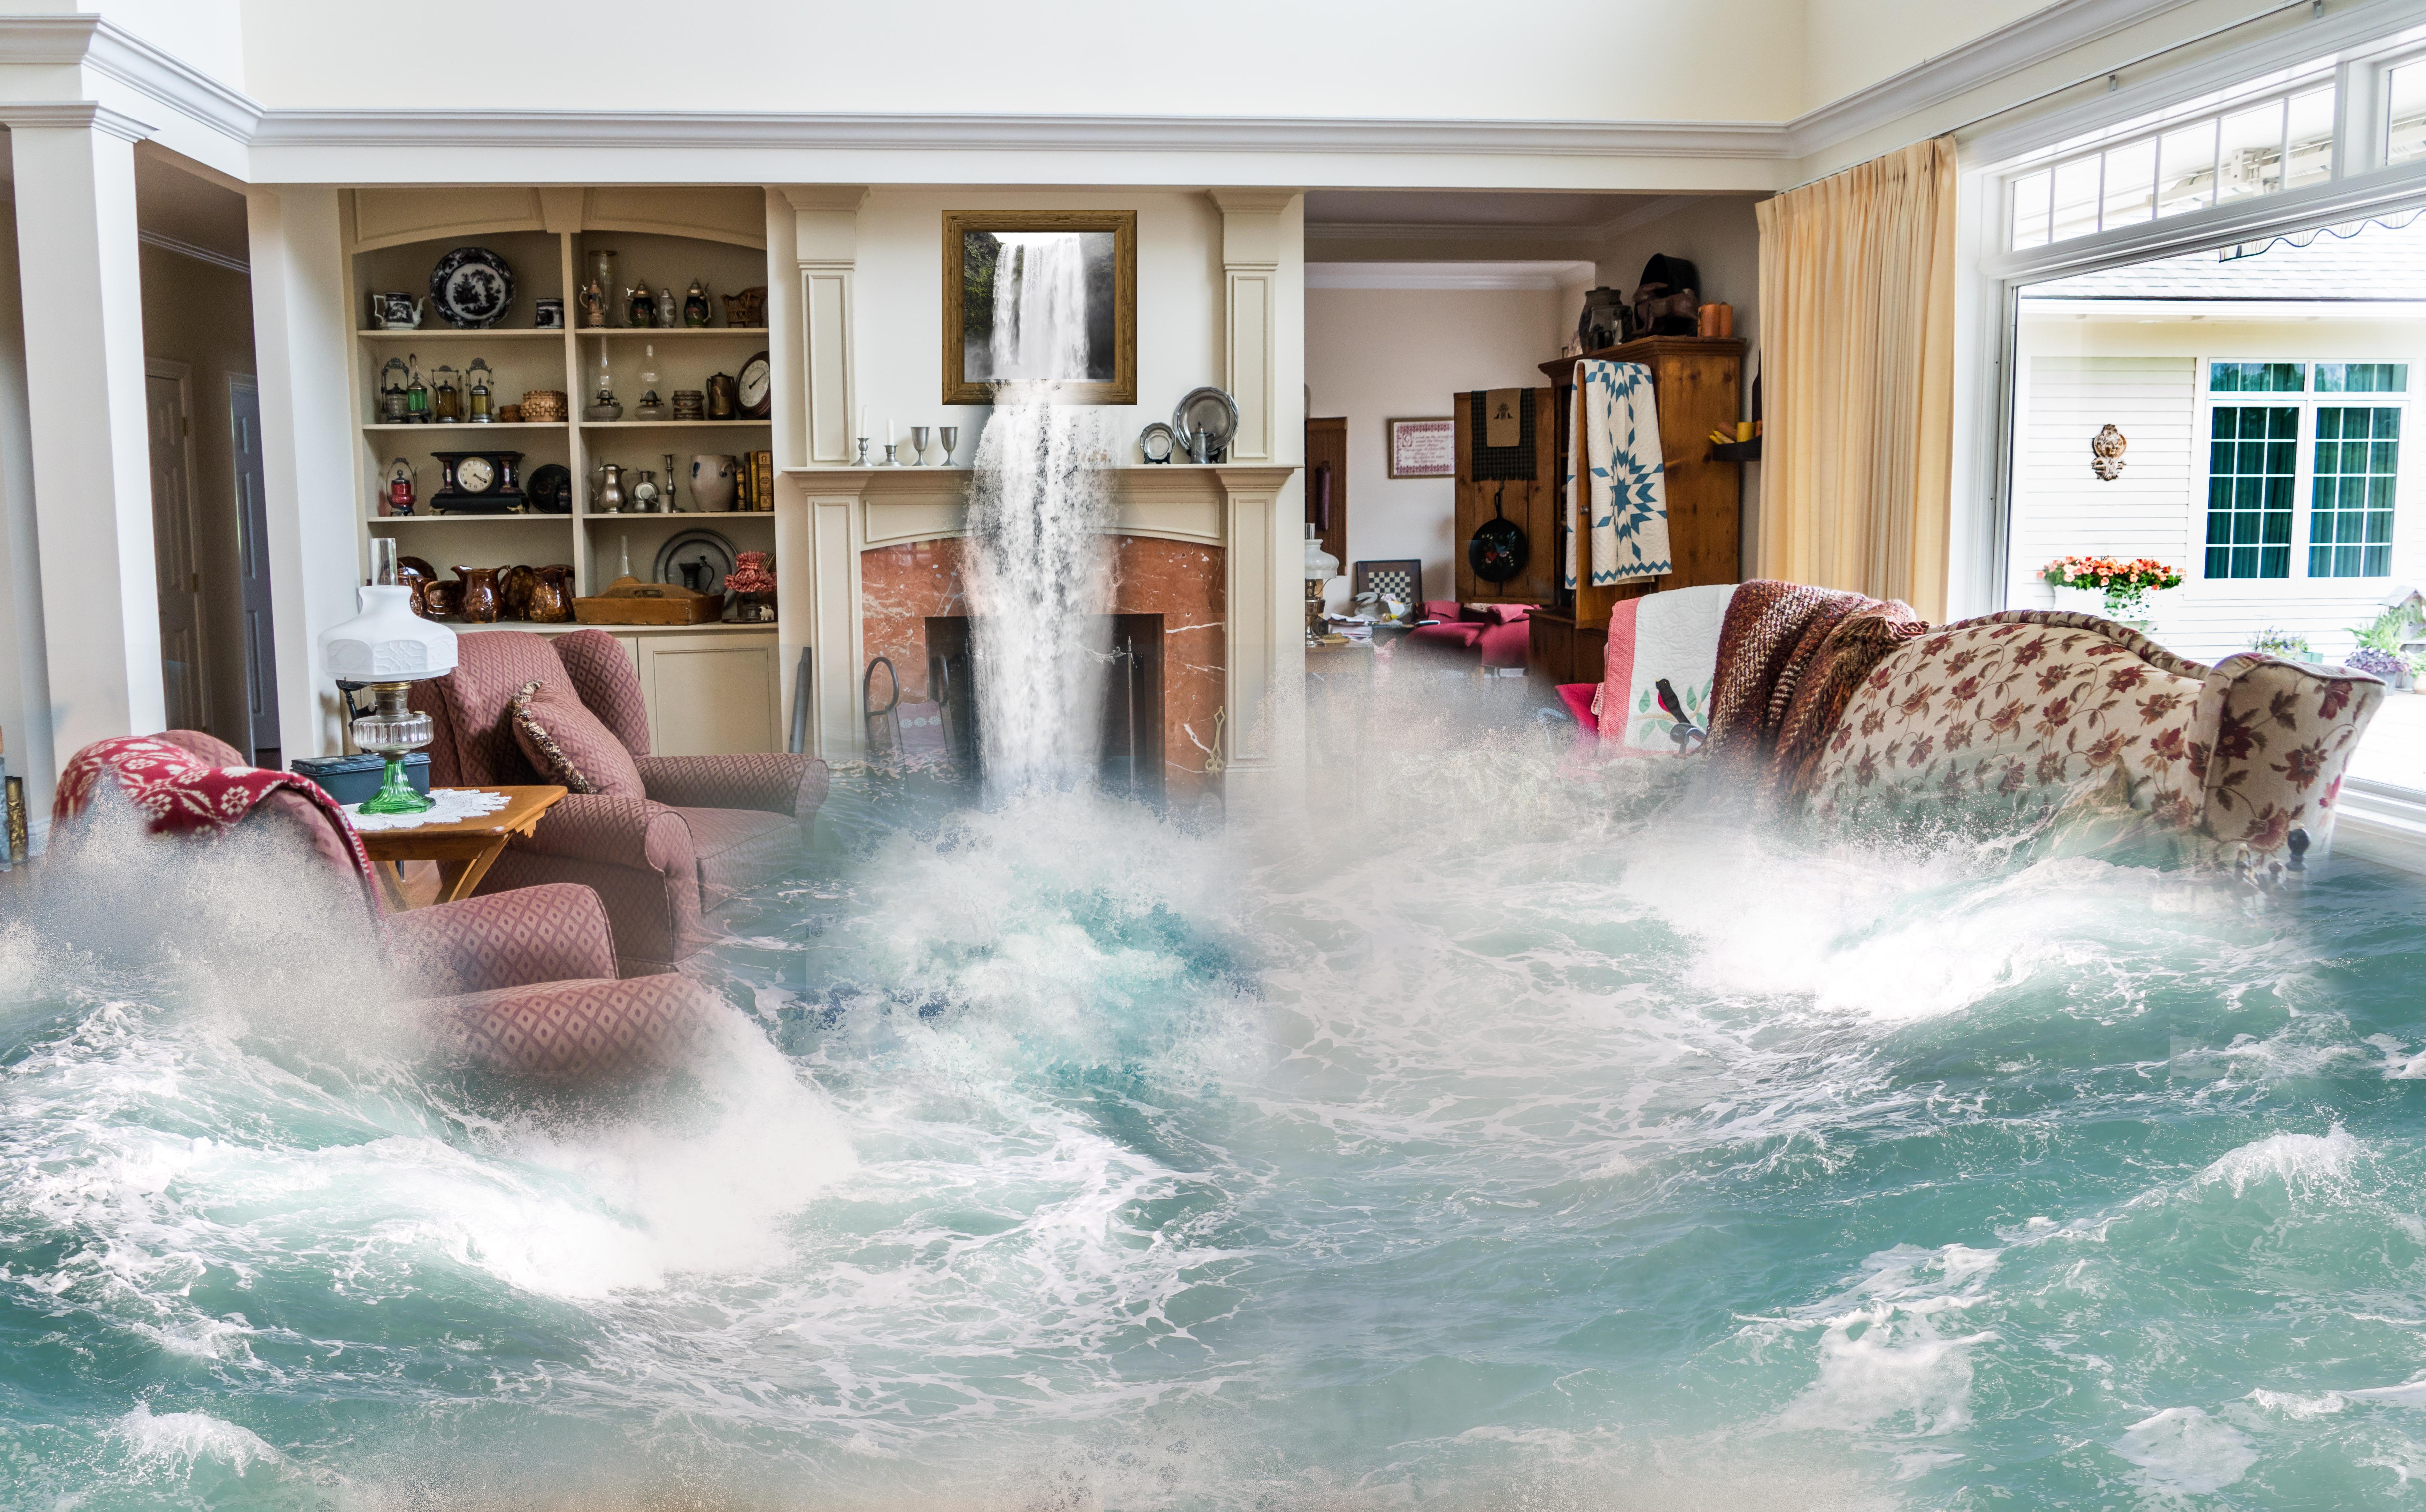 бин потоп в квартире фото картинки азартны